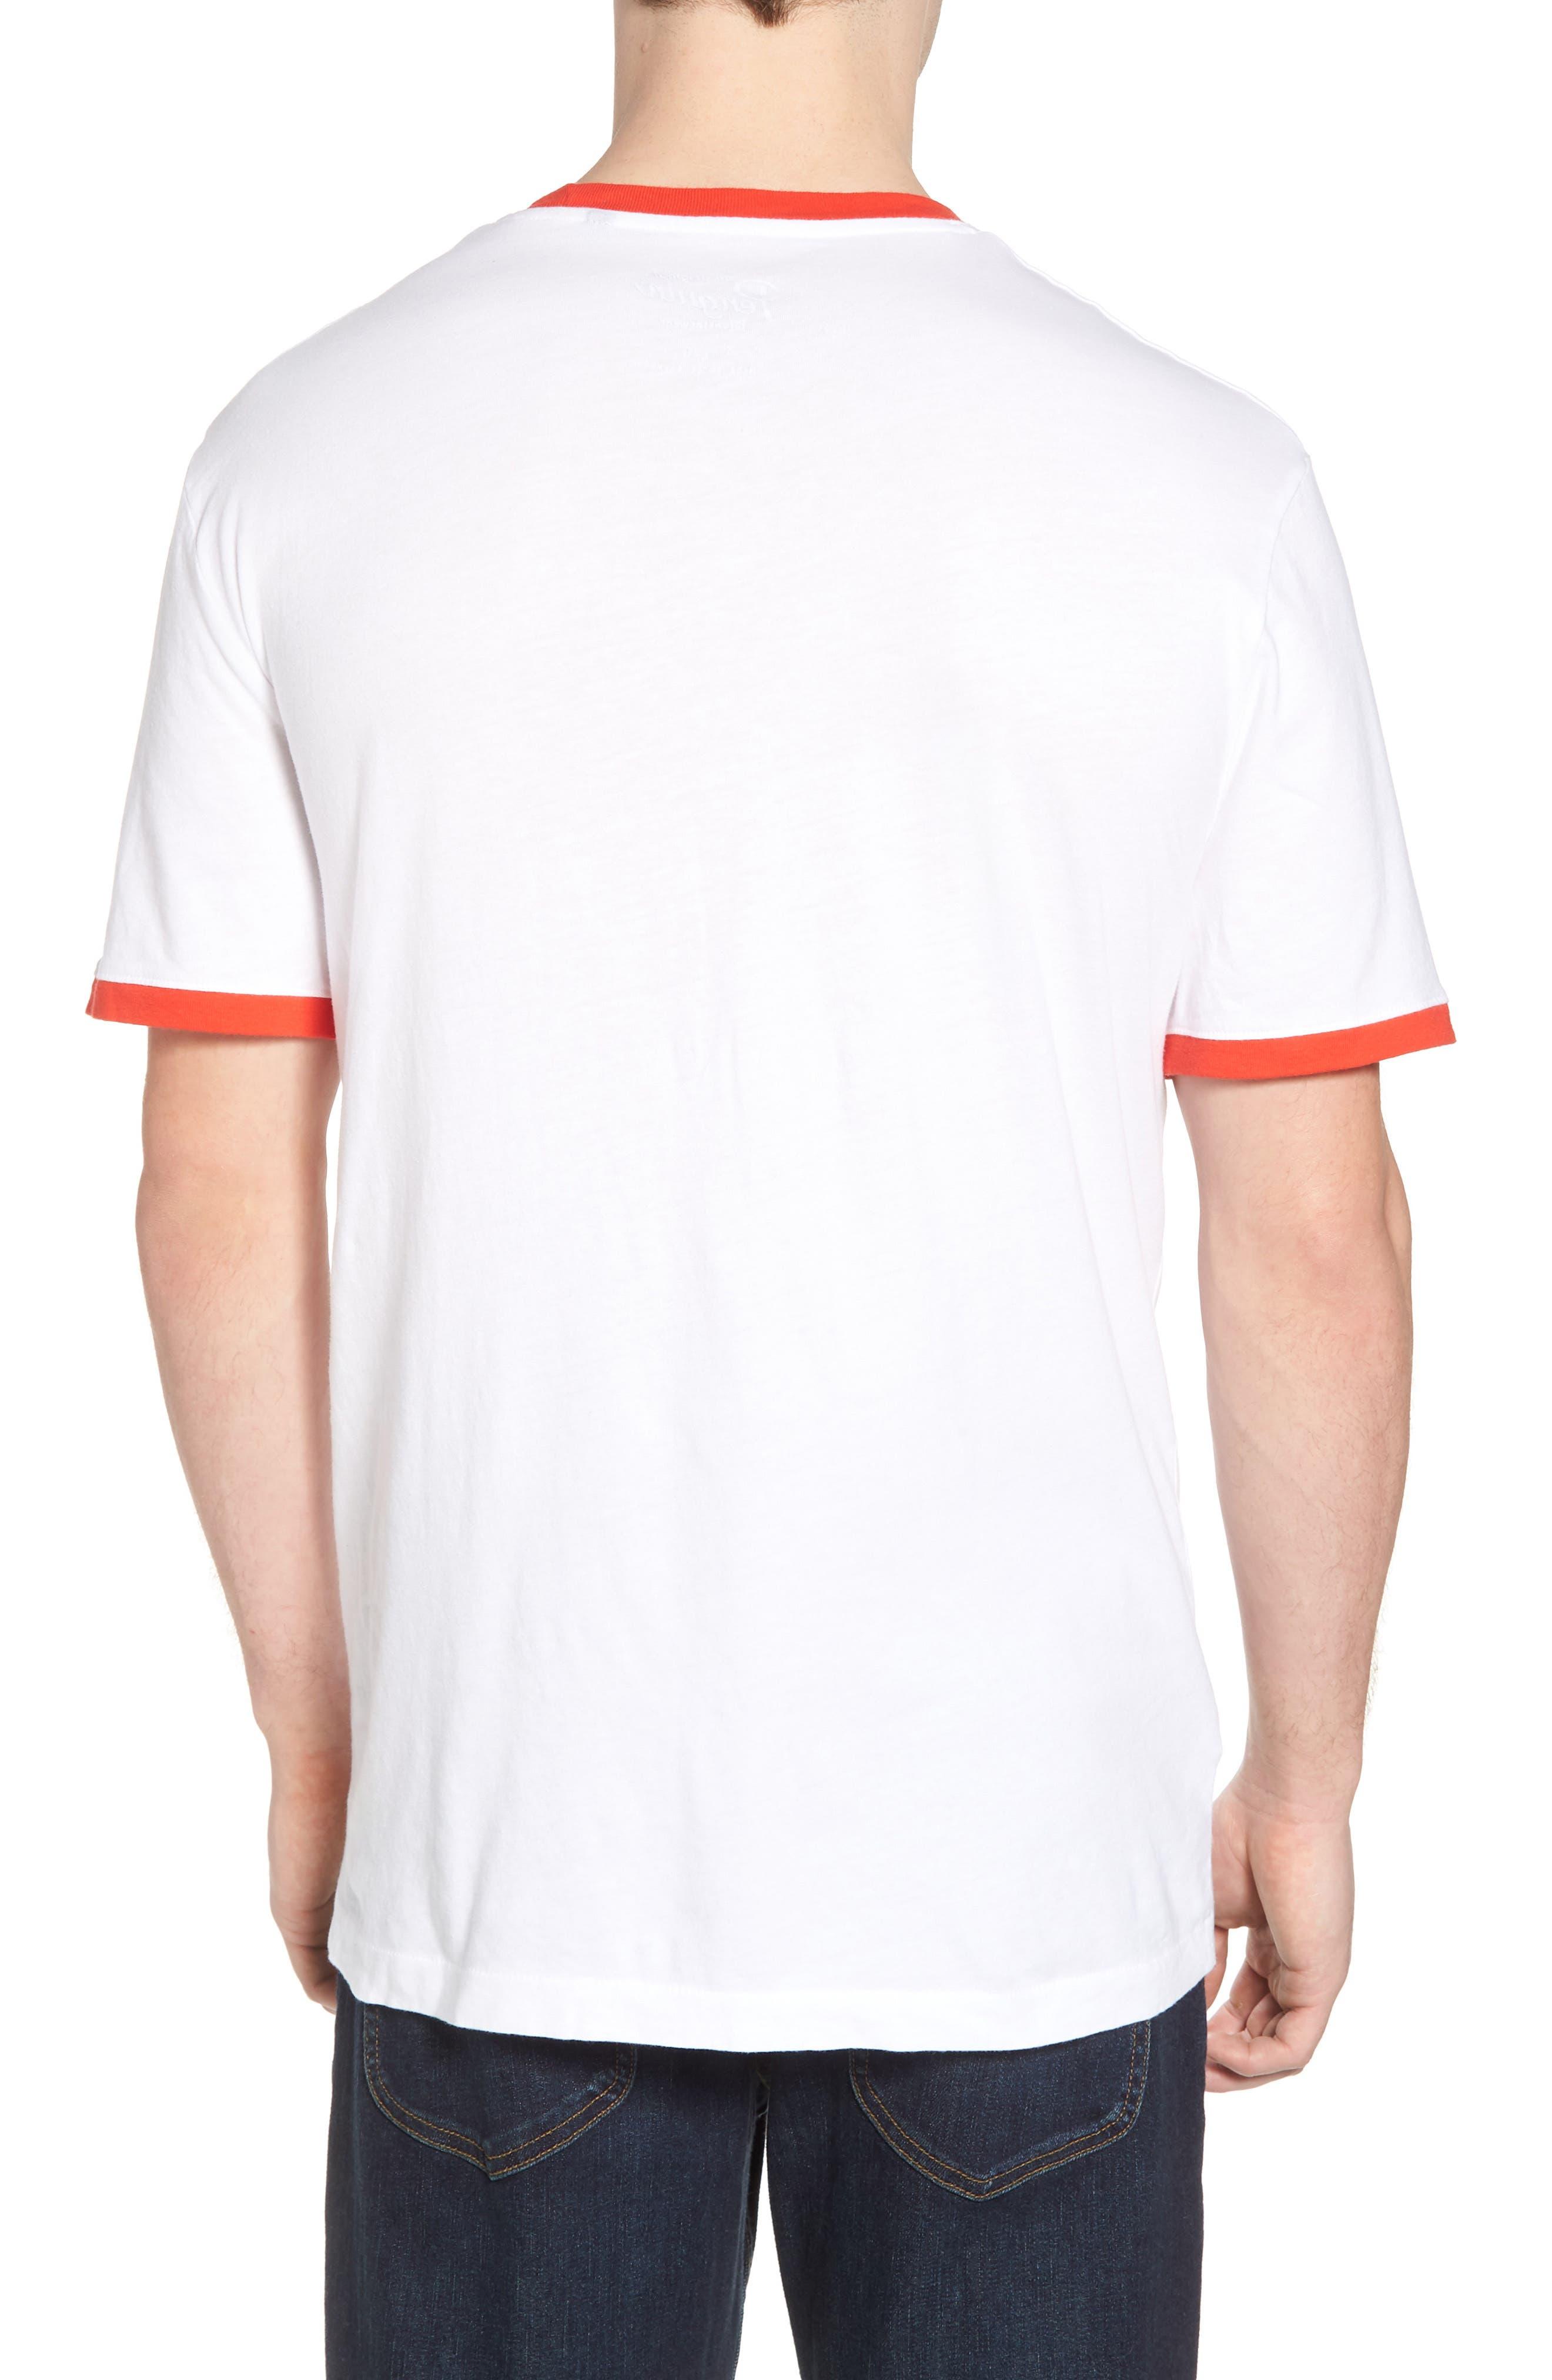 Stay Weird T-Shirt,                             Alternate thumbnail 2, color,                             118